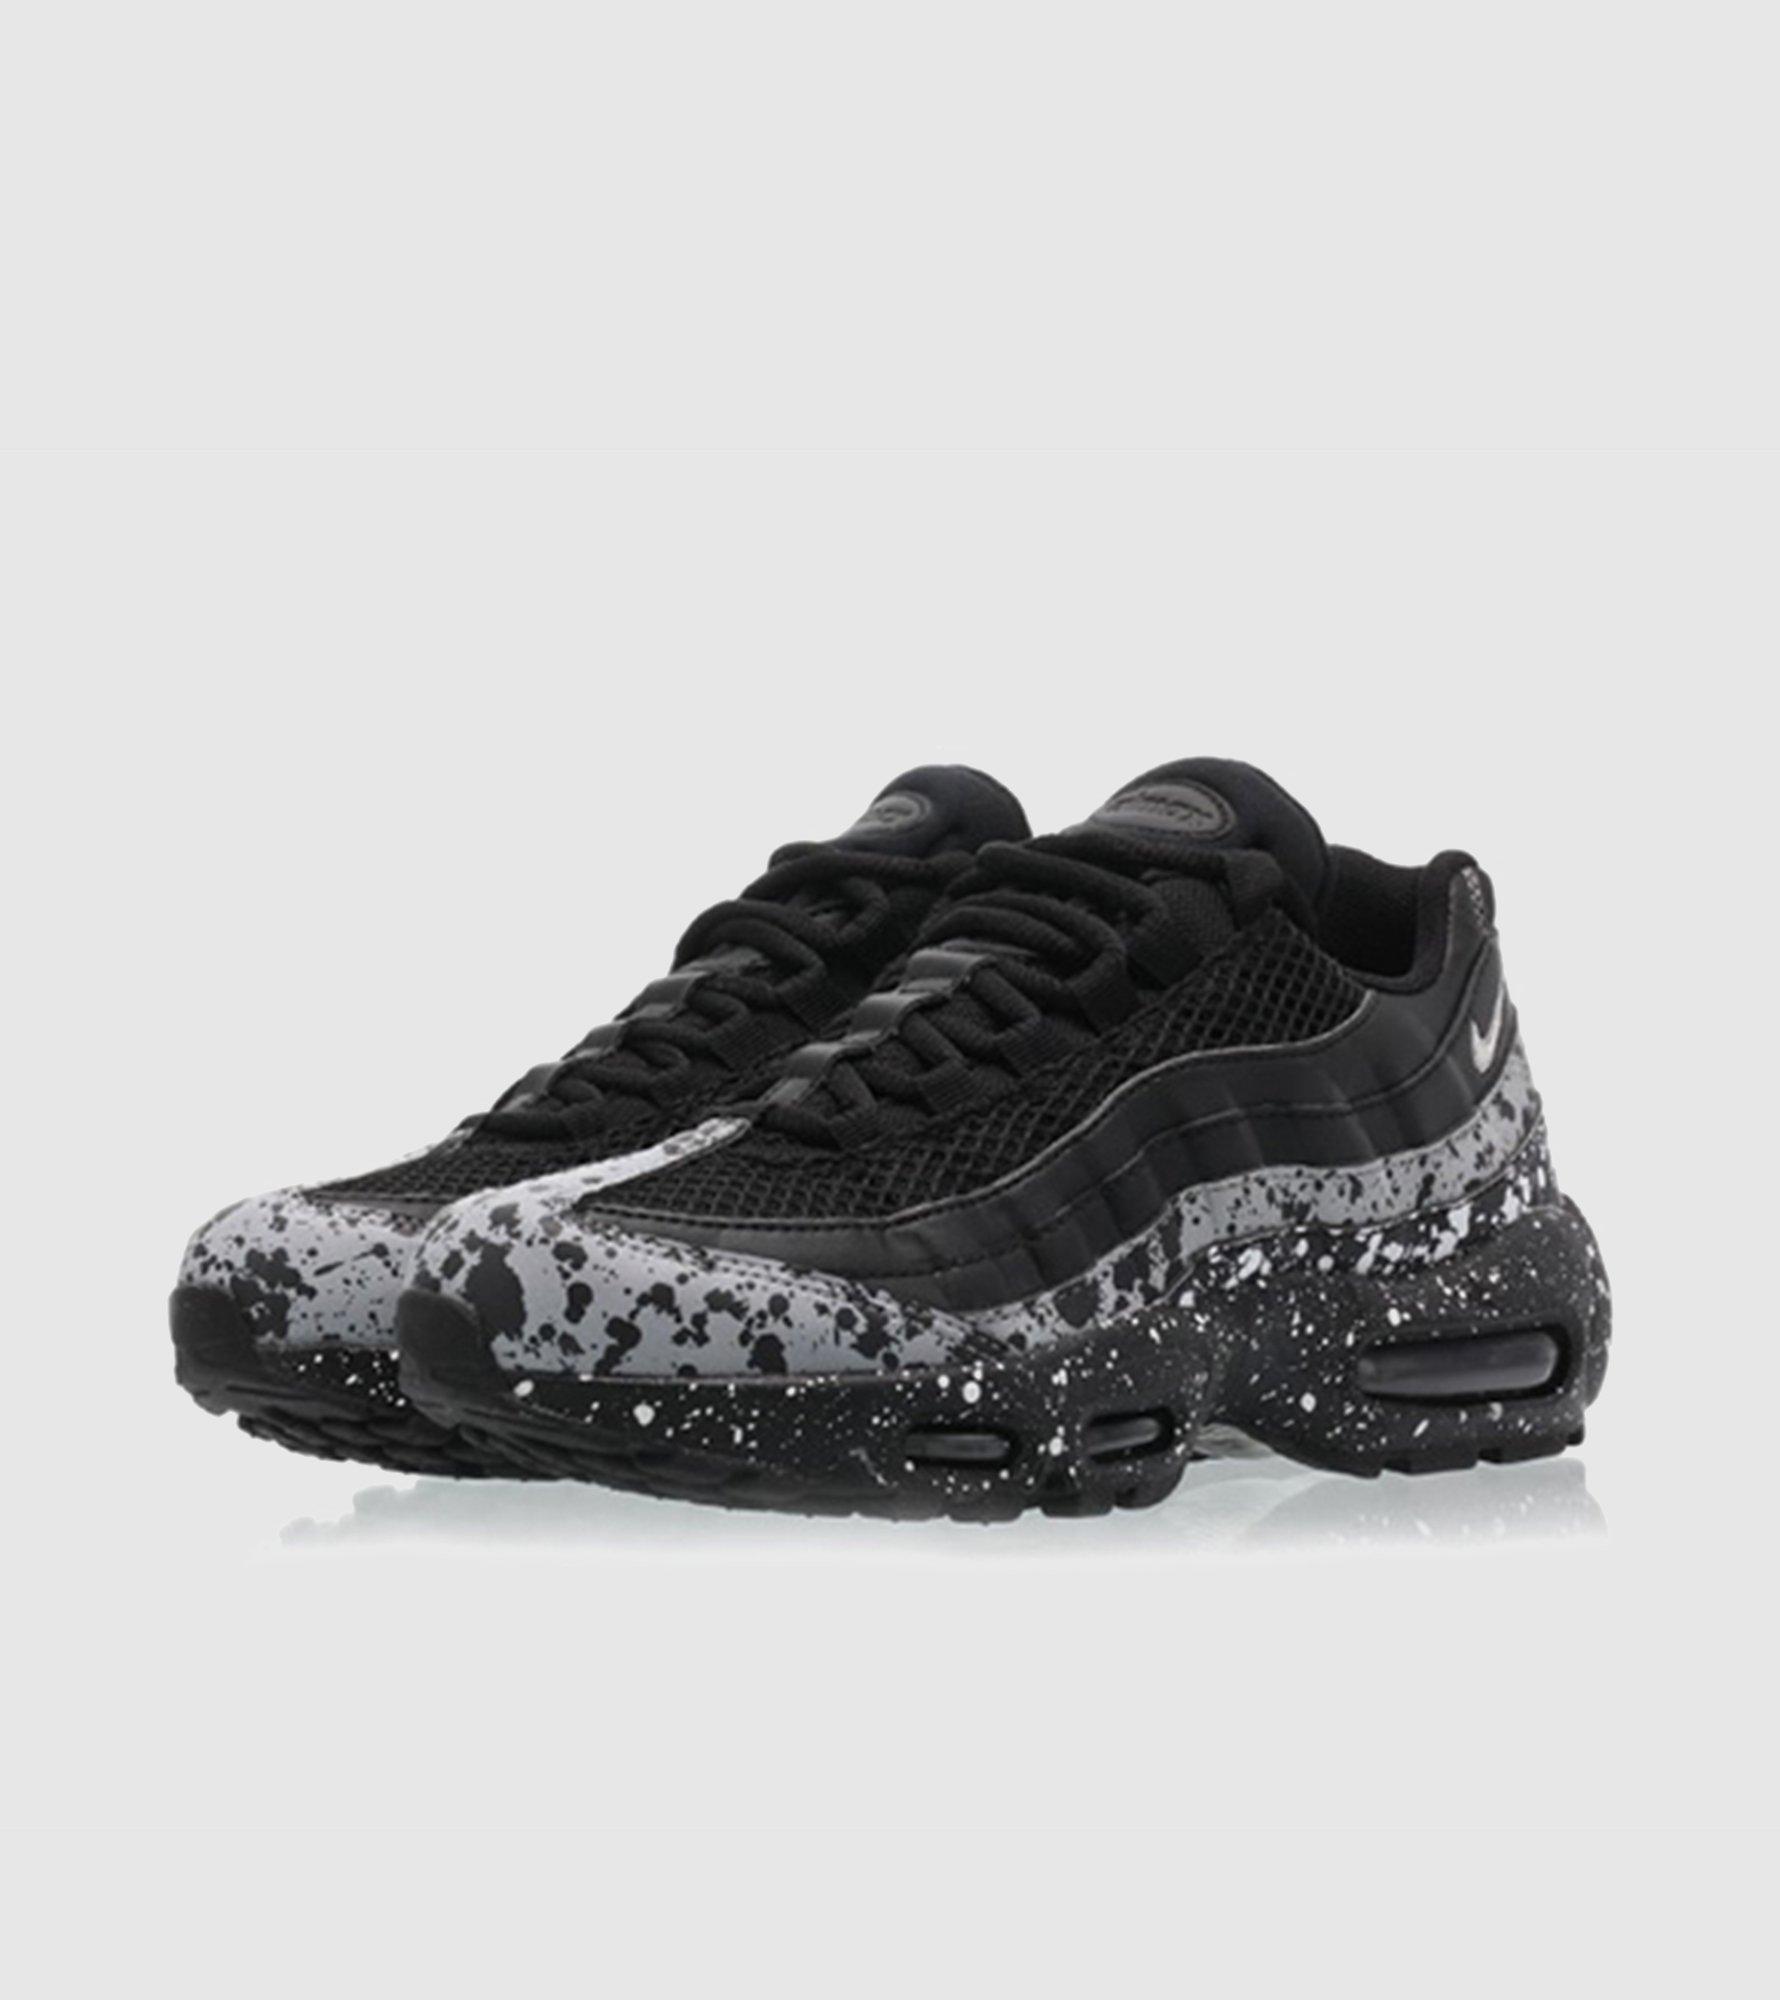 Lyst Nike Air Max 95 Terrazzo Women's in Black